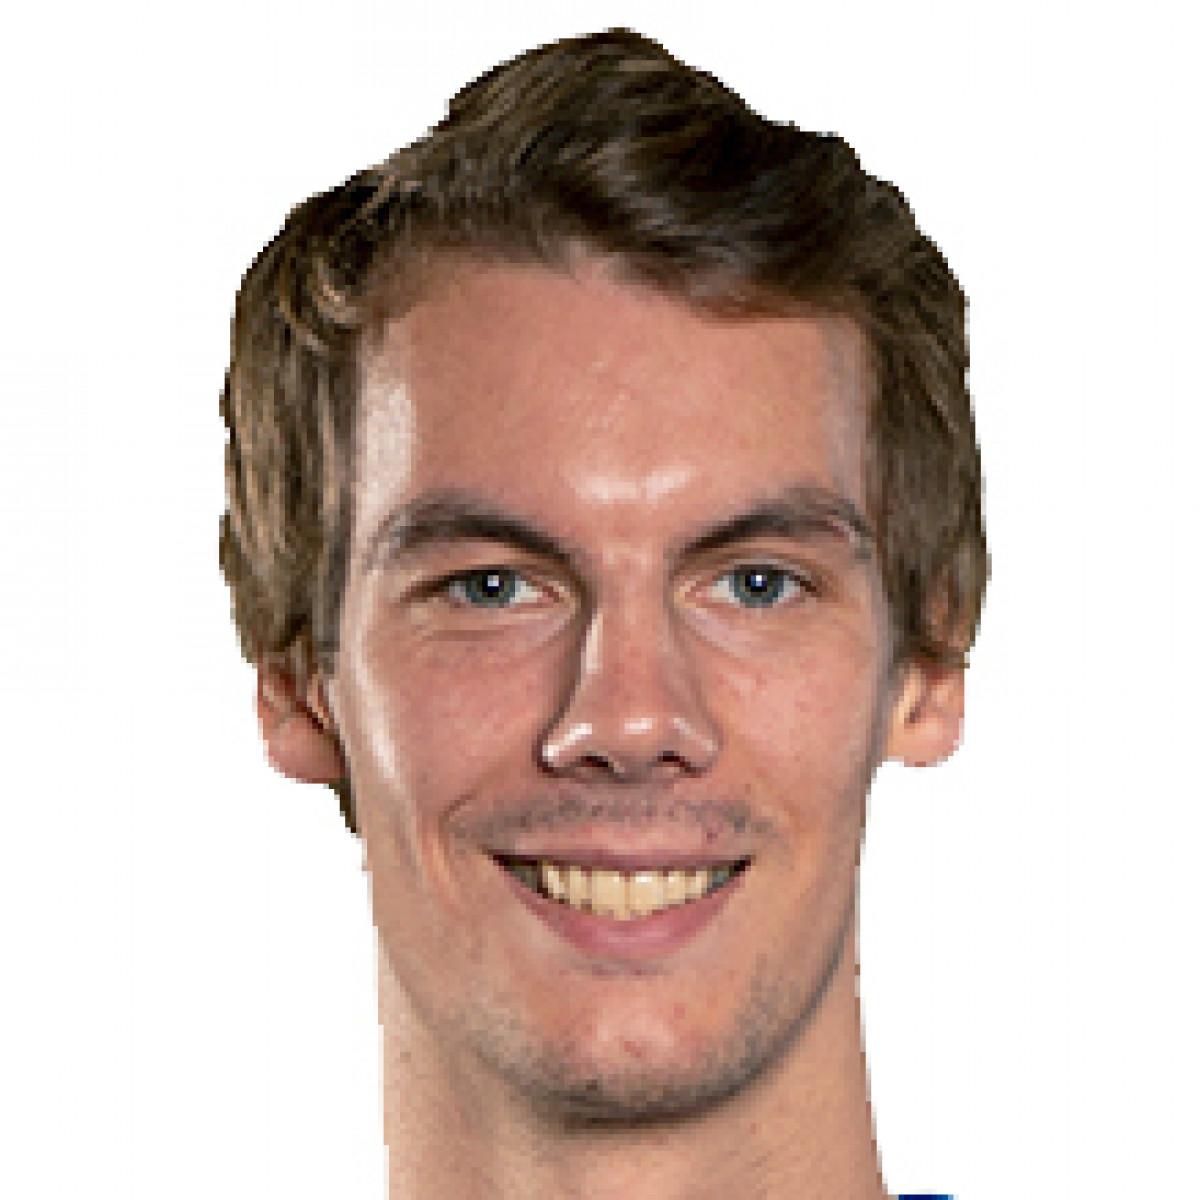 Lars Wendt